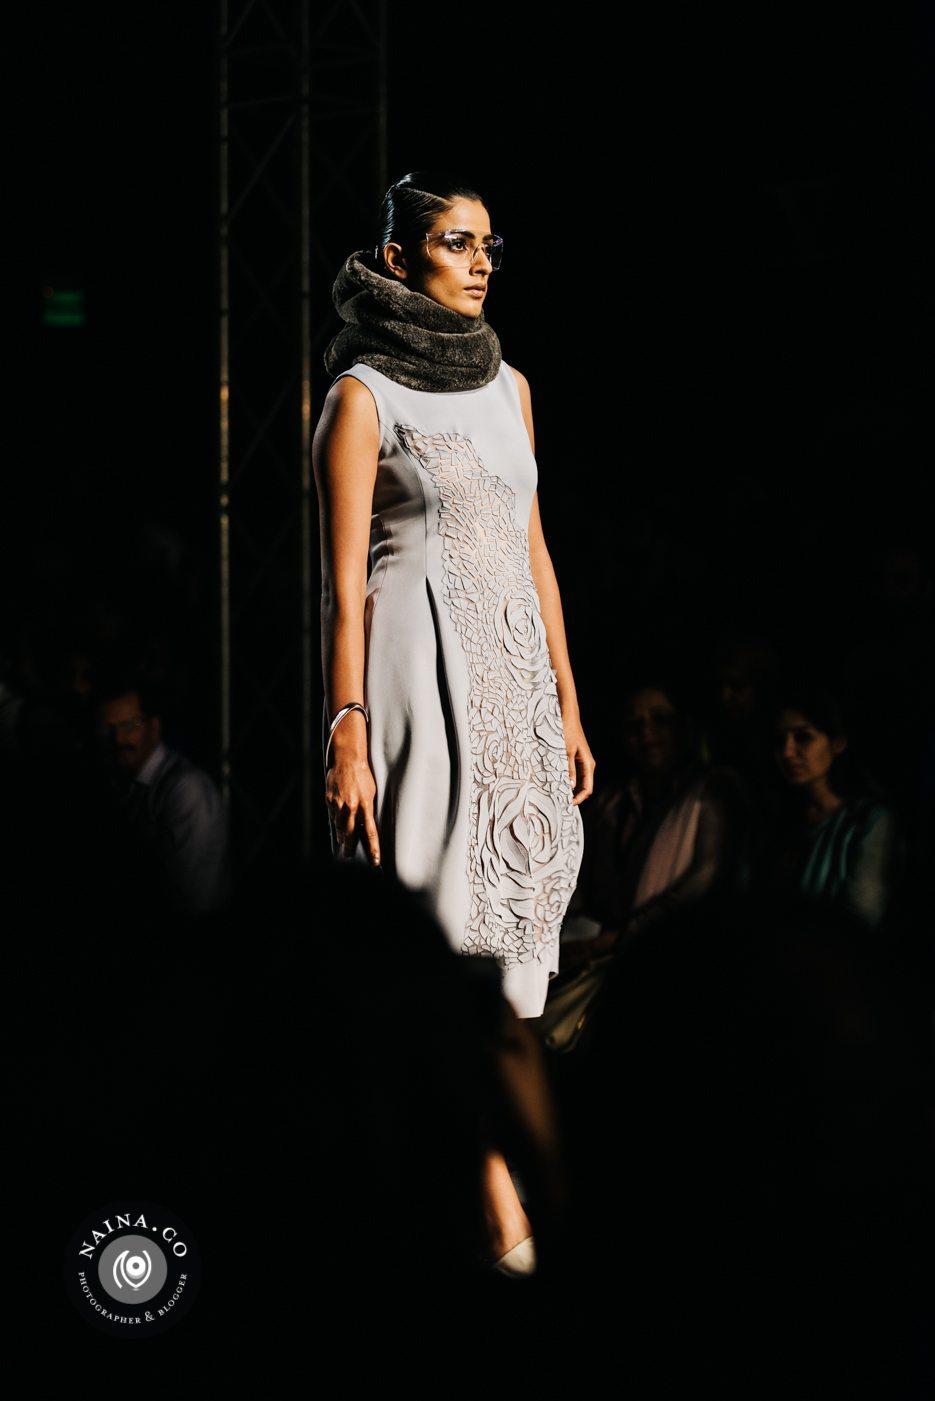 Naina.co-Raconteuse-Visuelle-Photographer-Blogger-Storyteller-Luxury-Lifestyle-AIFWAW15-Pankaj-Nidhi-06